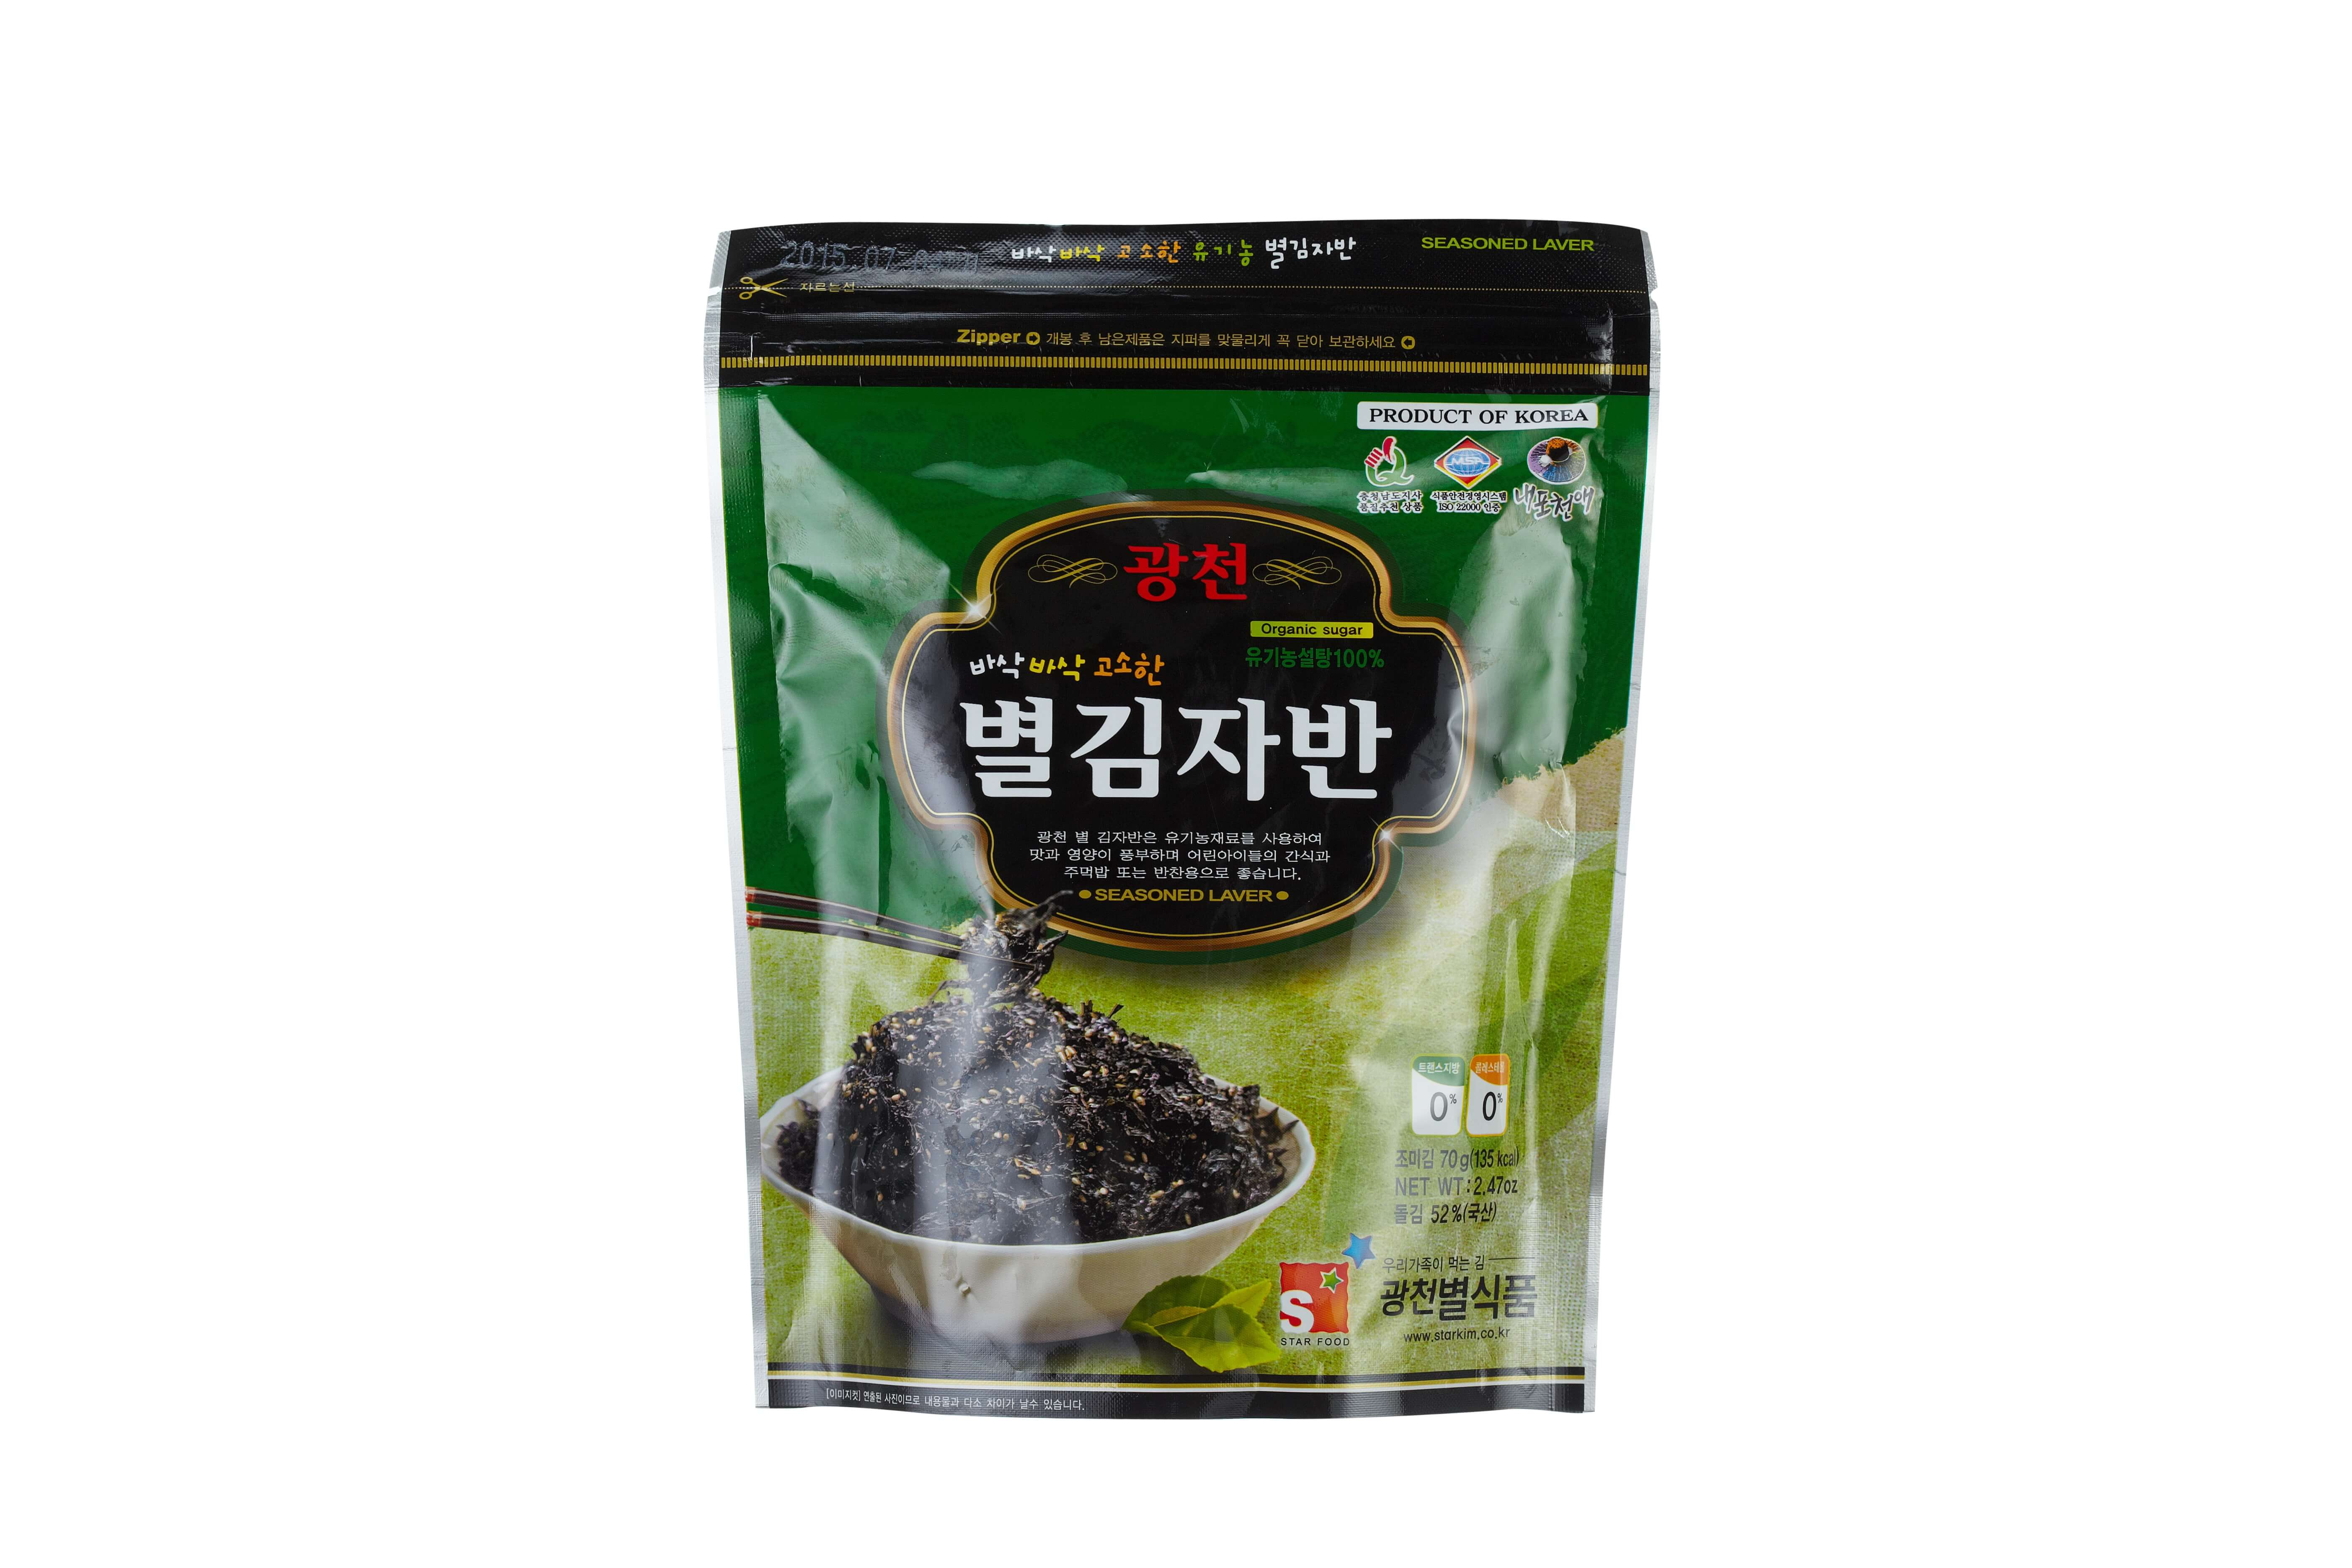 [50gx20]Gwangcheon BYUL MAT Roasted Laver(Jaban Laver)